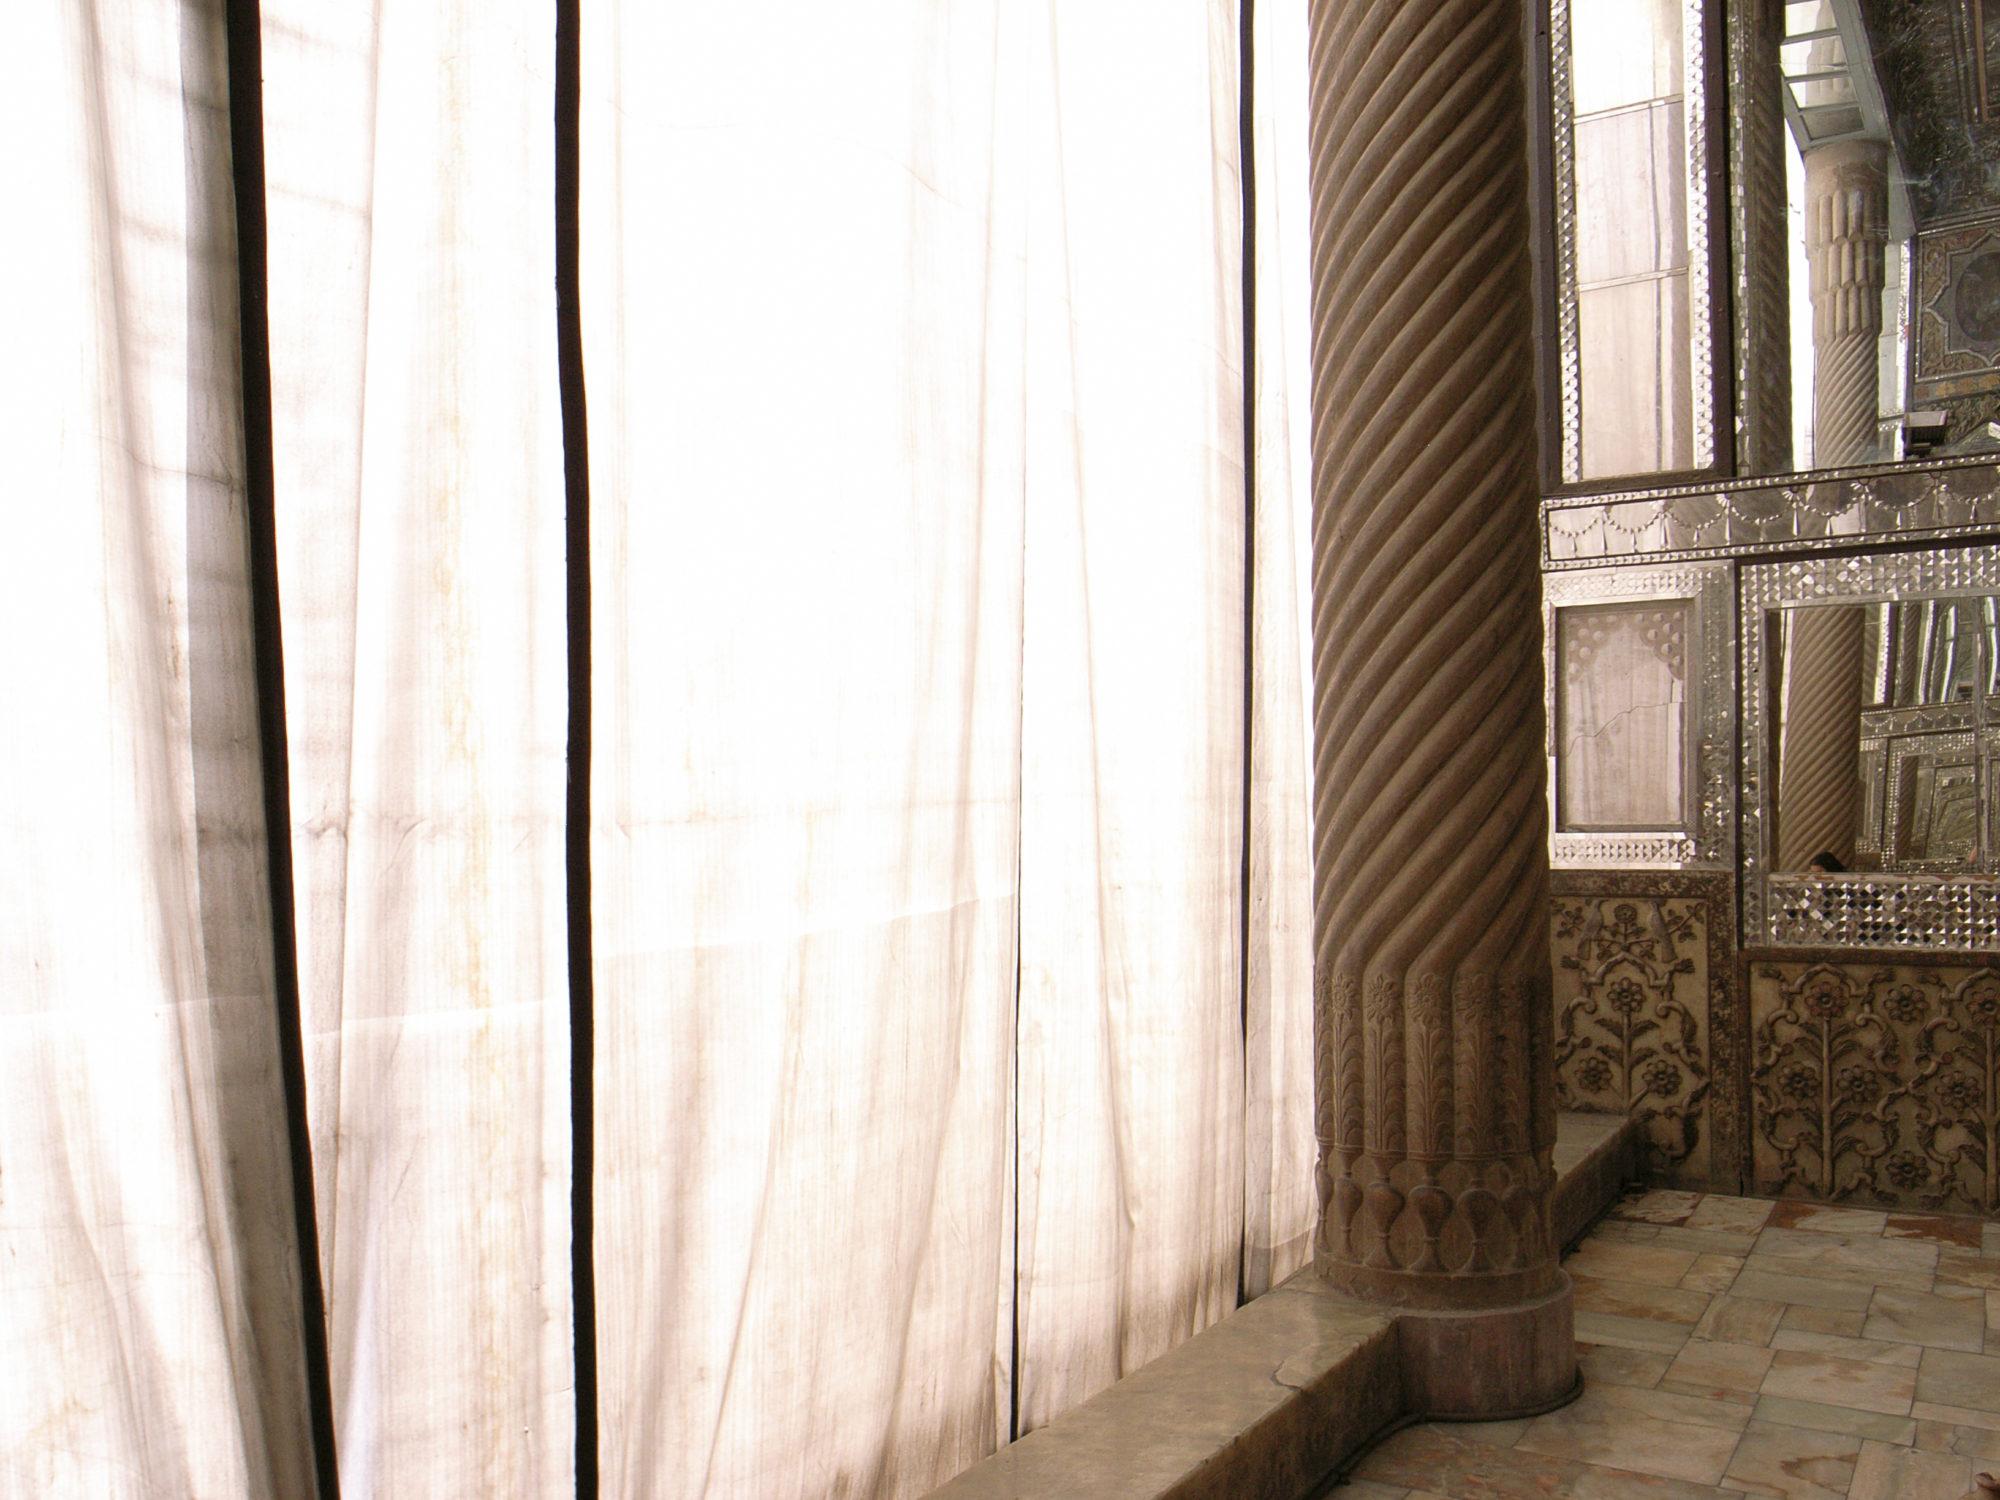 Golestan Palast Teheran, Innenaufnahme